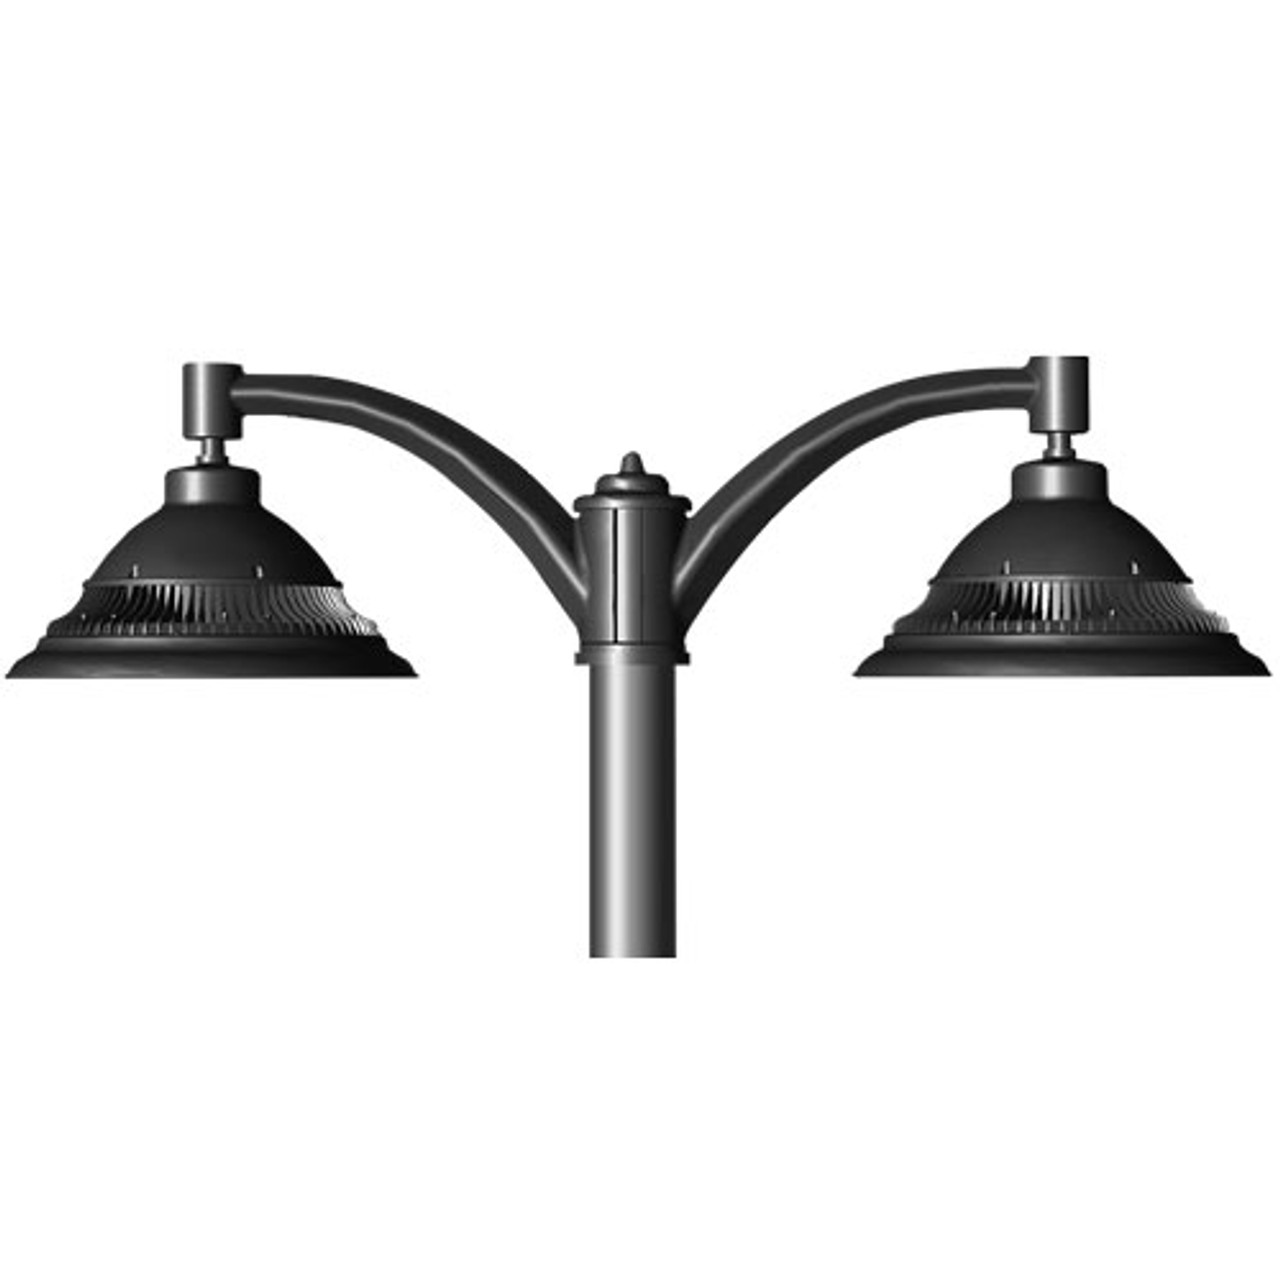 Bell 2 x 84 Watt Pendant LED Decorative Pole Mounted